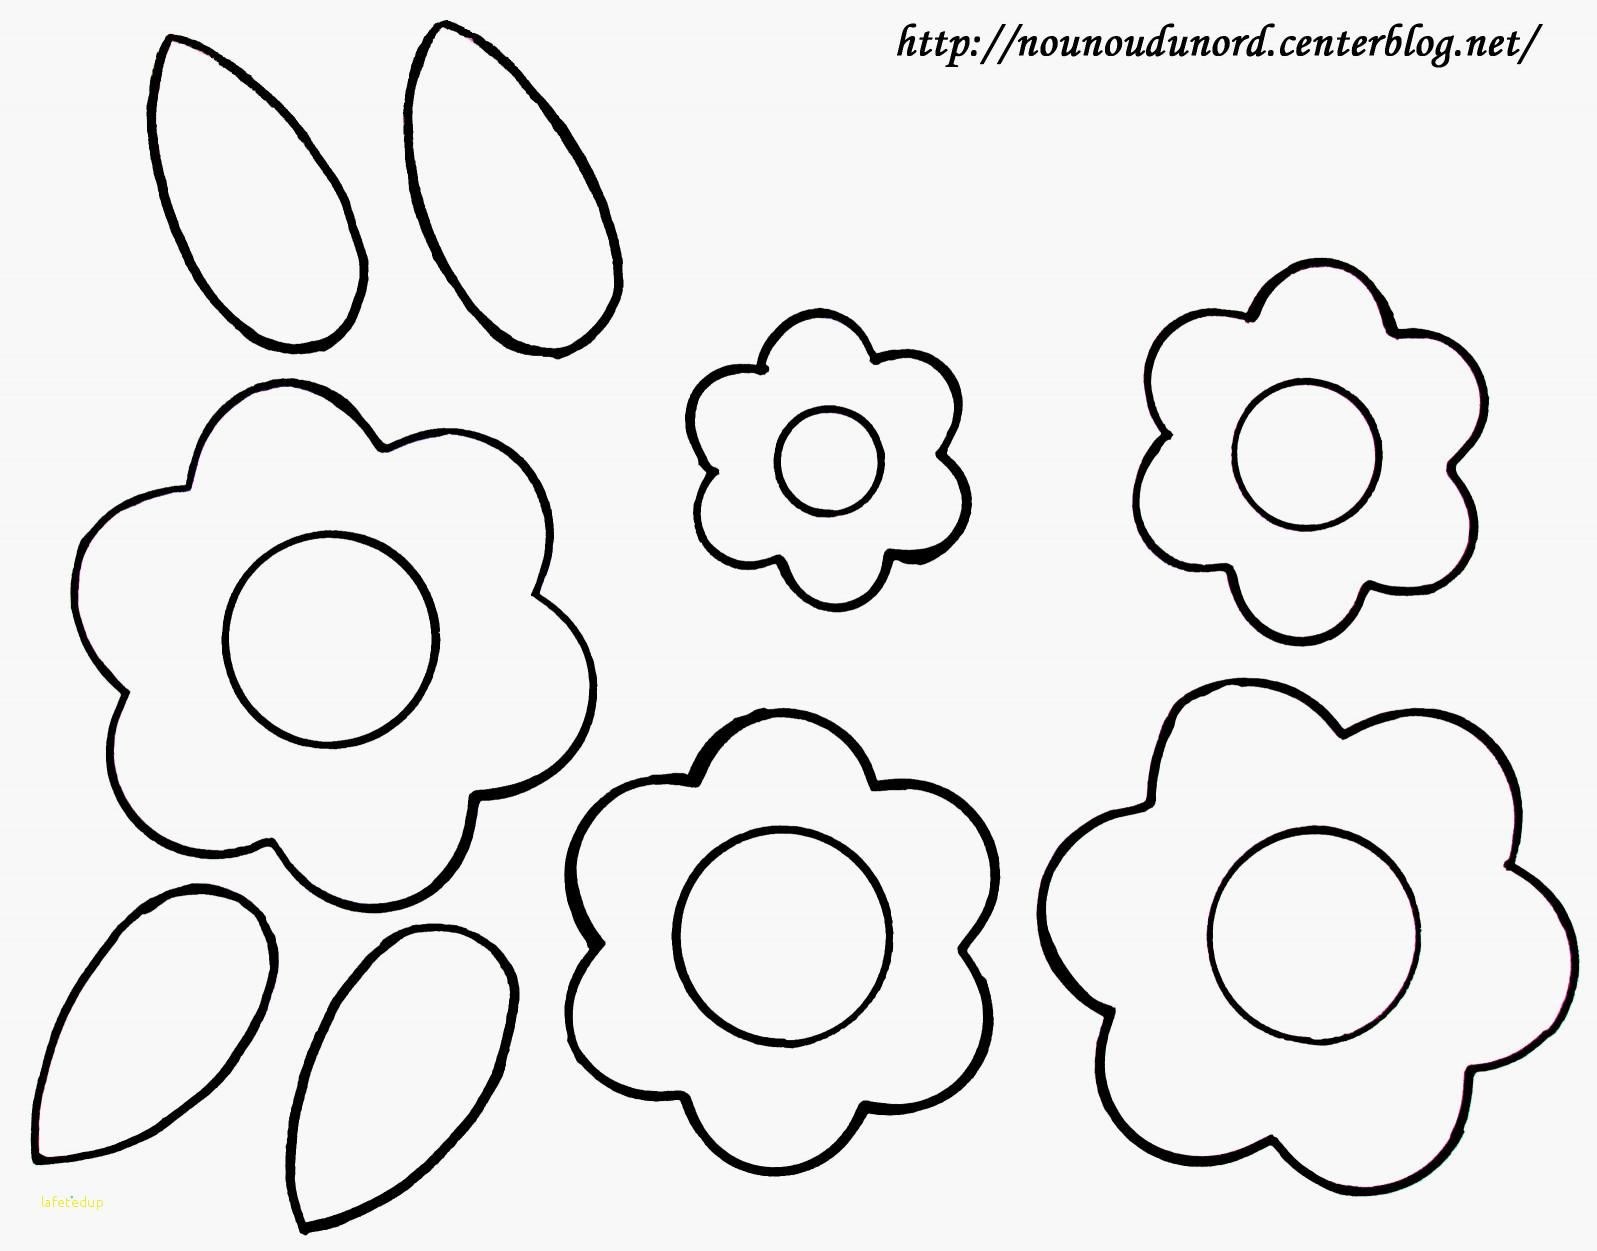 Coloriages A Imprimer Fleurs Numero 36e2e1f5